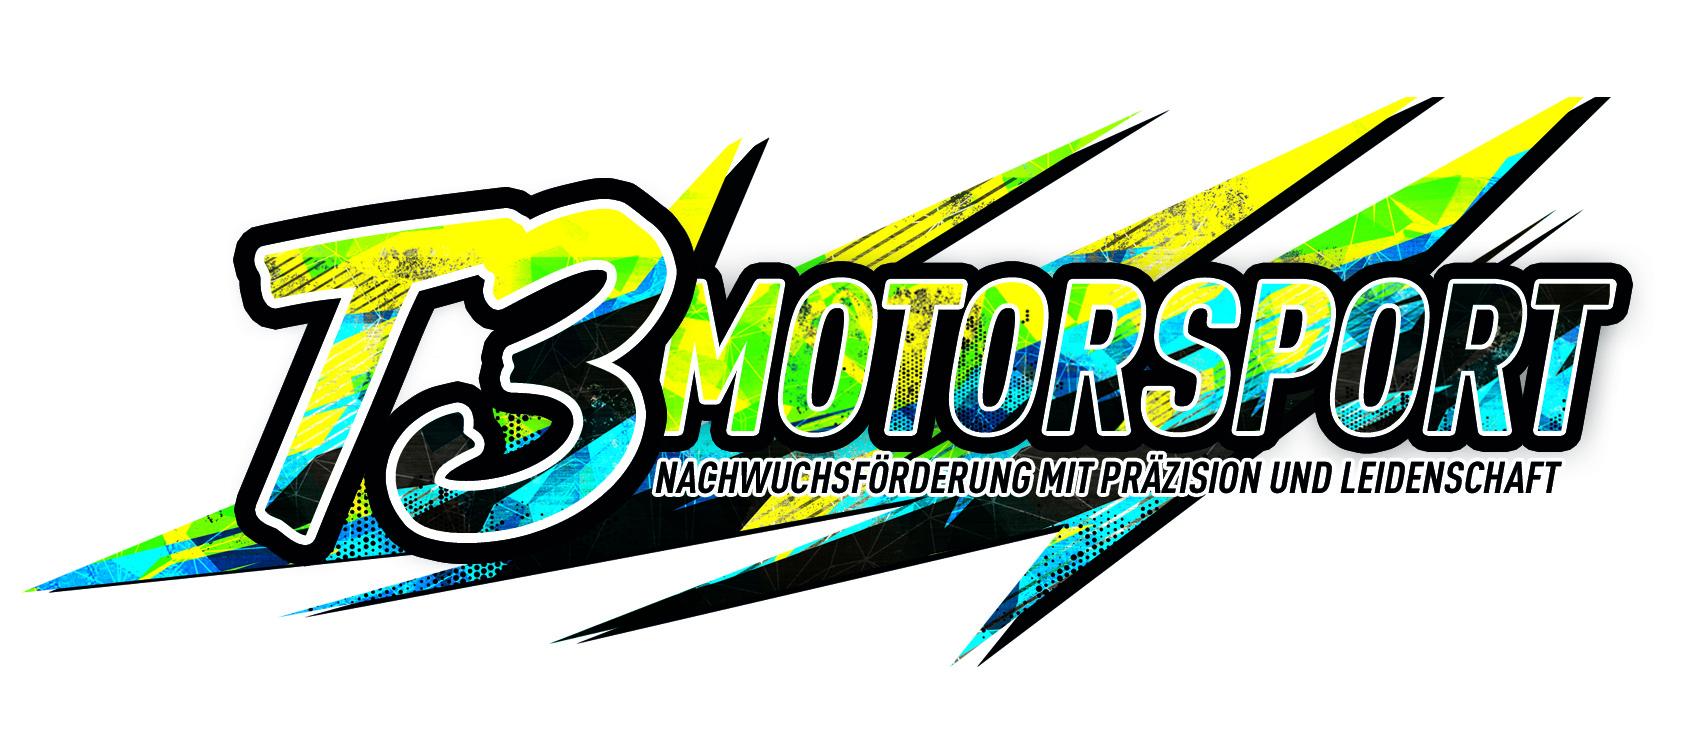 T3 Motorsport, ADAC GT MASTERS, Spielberg (AT)